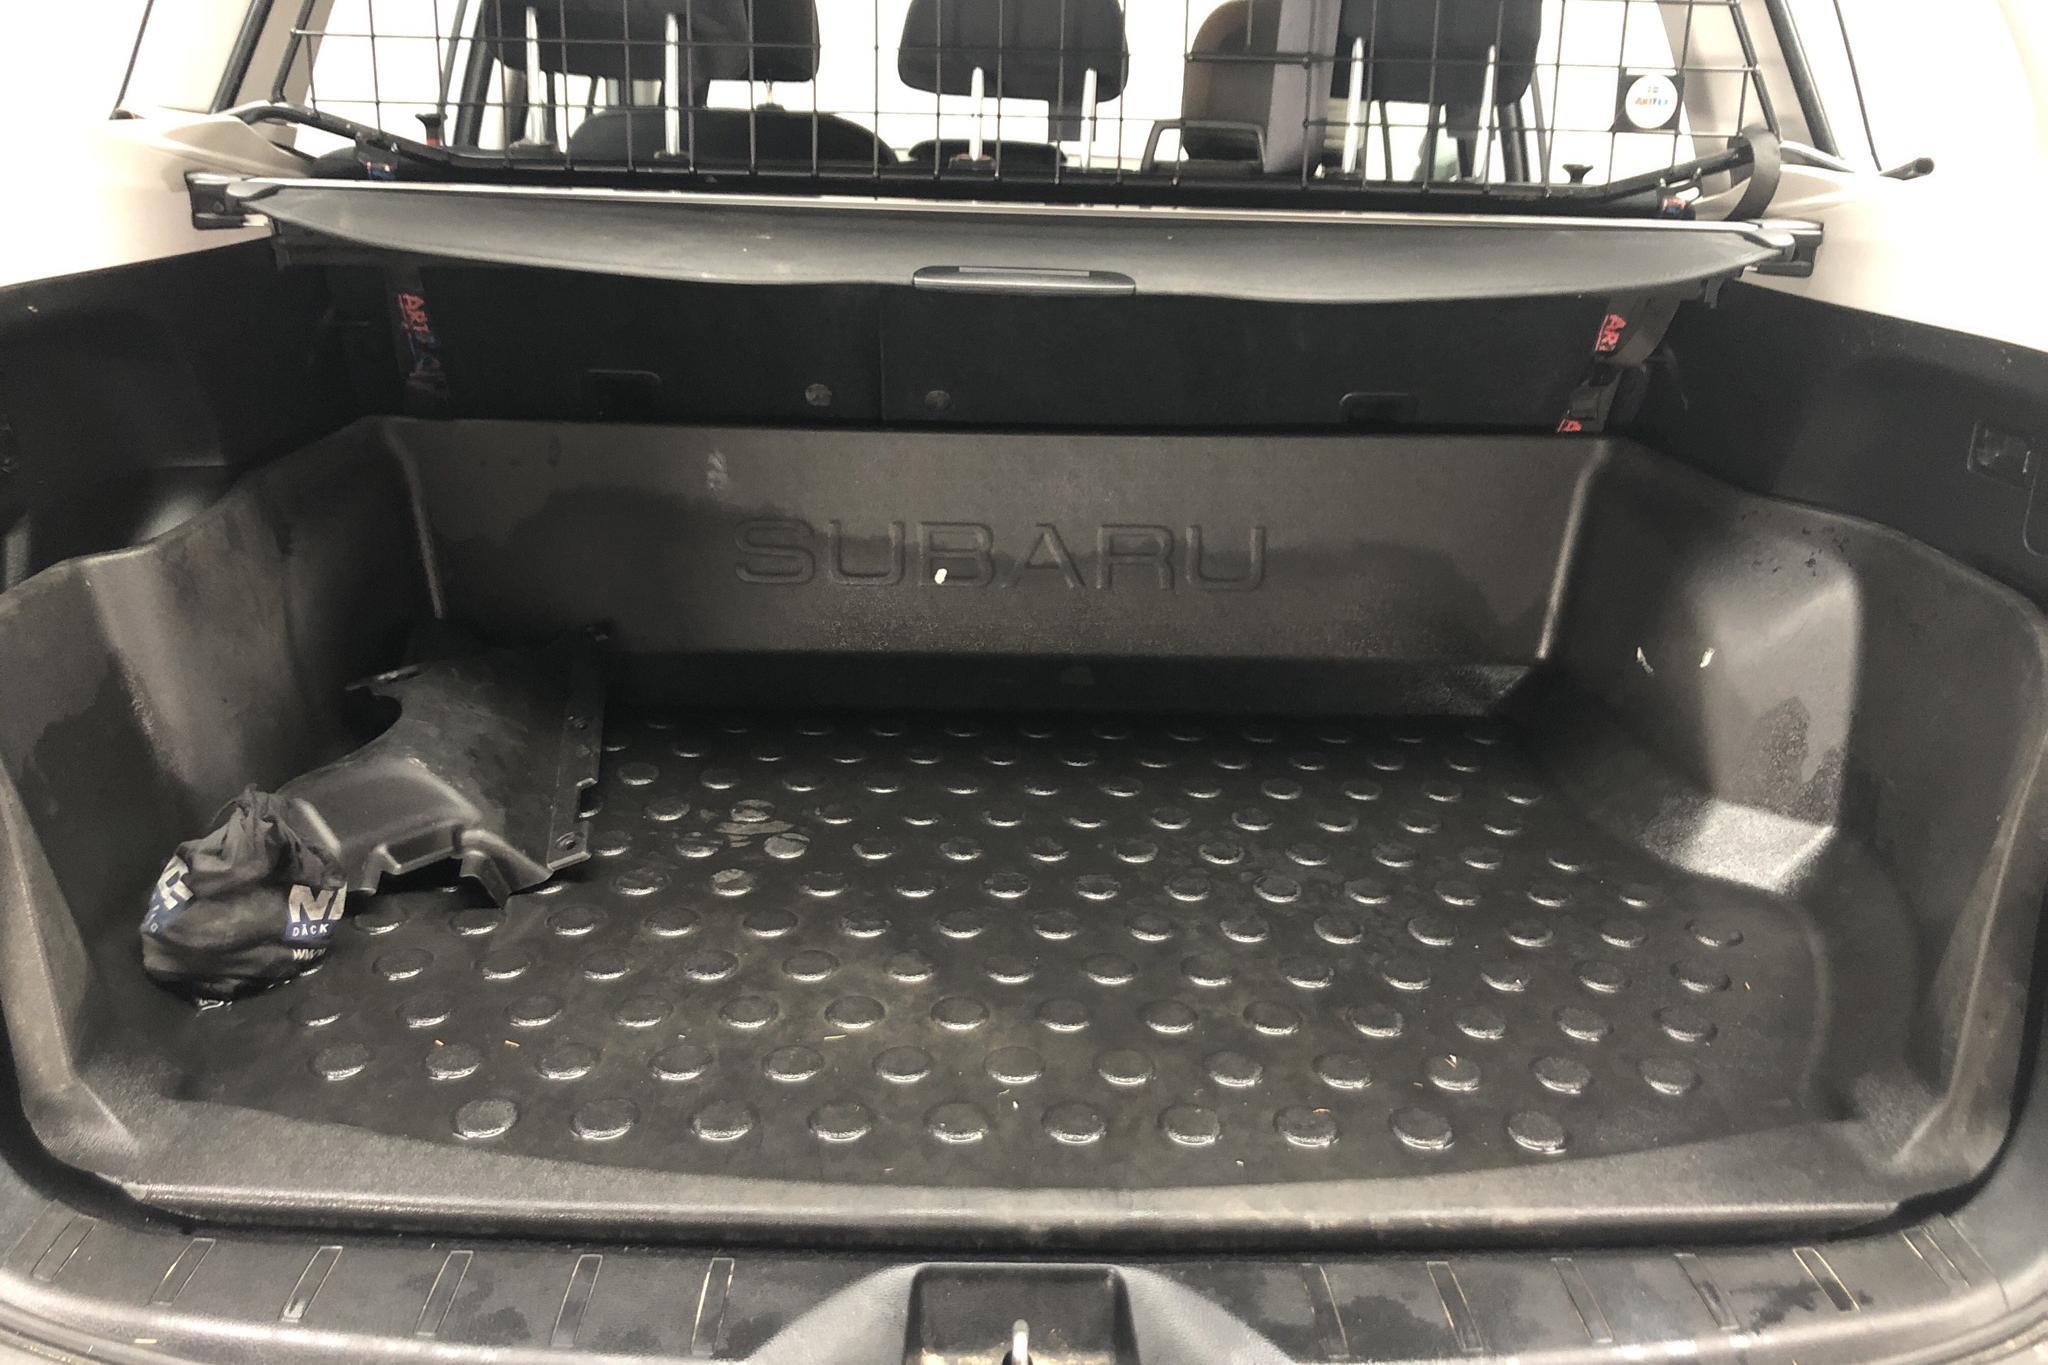 Subaru Forester 2.0D (147hk) - 80 800 km - Automatic - silver - 2015